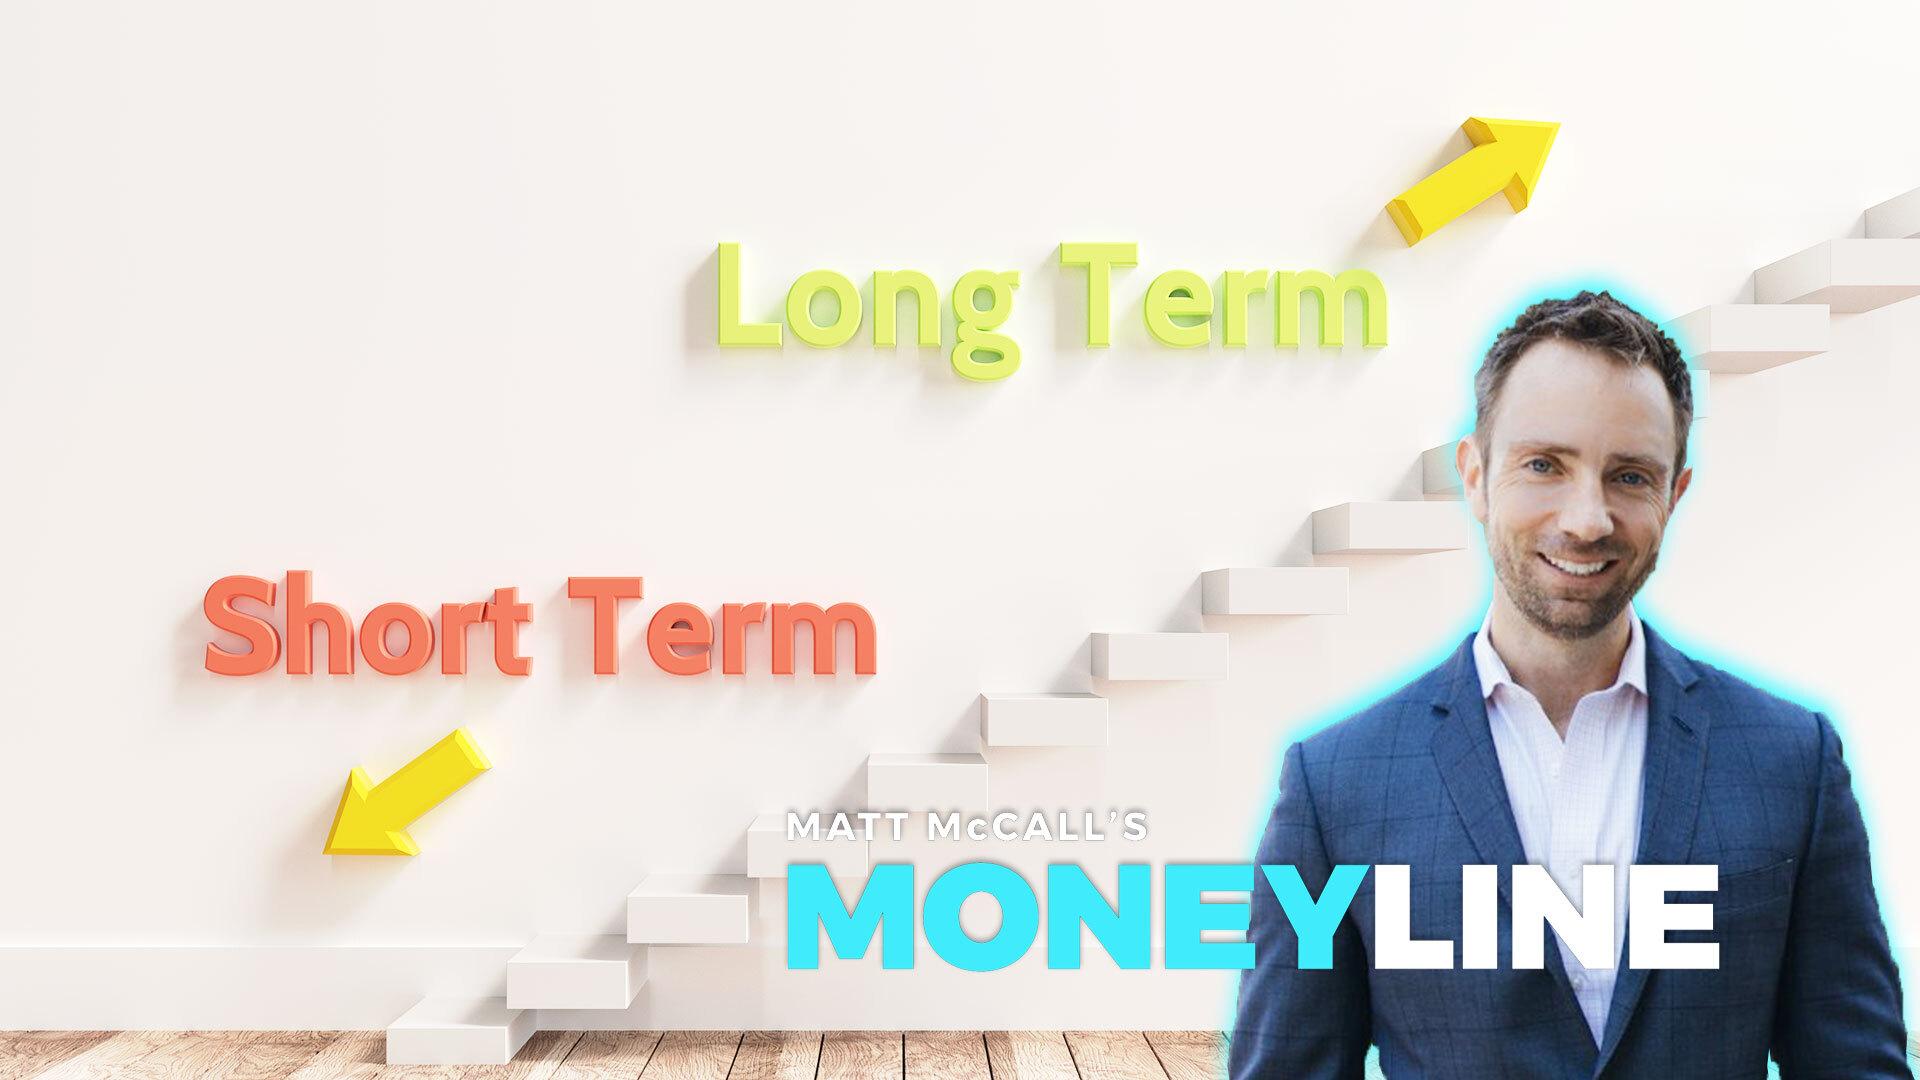 Matt McCall's Moneyline: Is it Time to Sell?